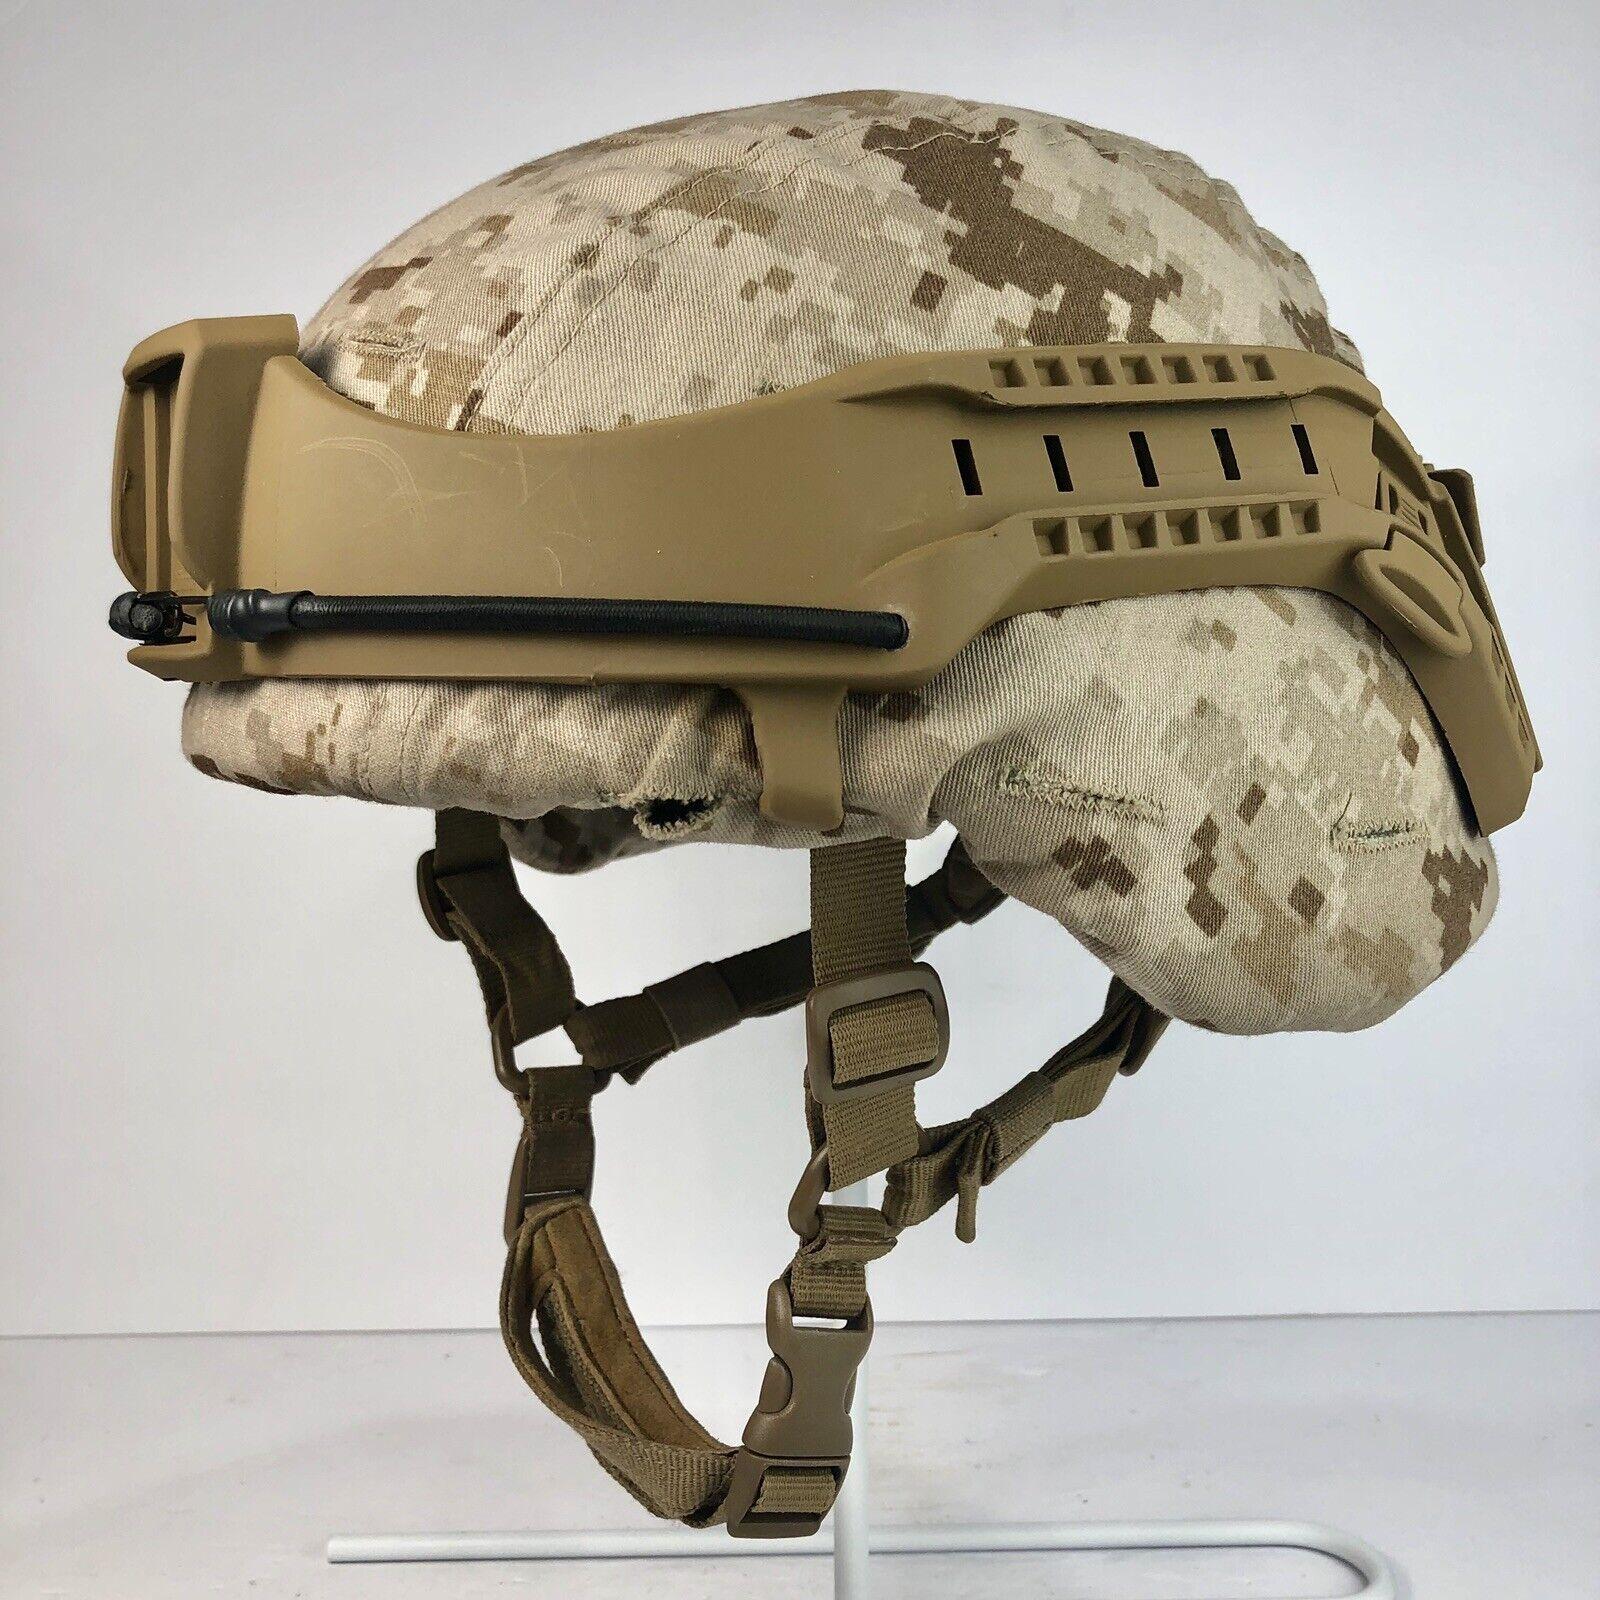 MICH PASGT Lightweight Marine Helmets NVG Mount LIVIQILY Aluminium Tactical Helmet Accessories Vas Shroud W// 3-Hole Pattern Fit ACH